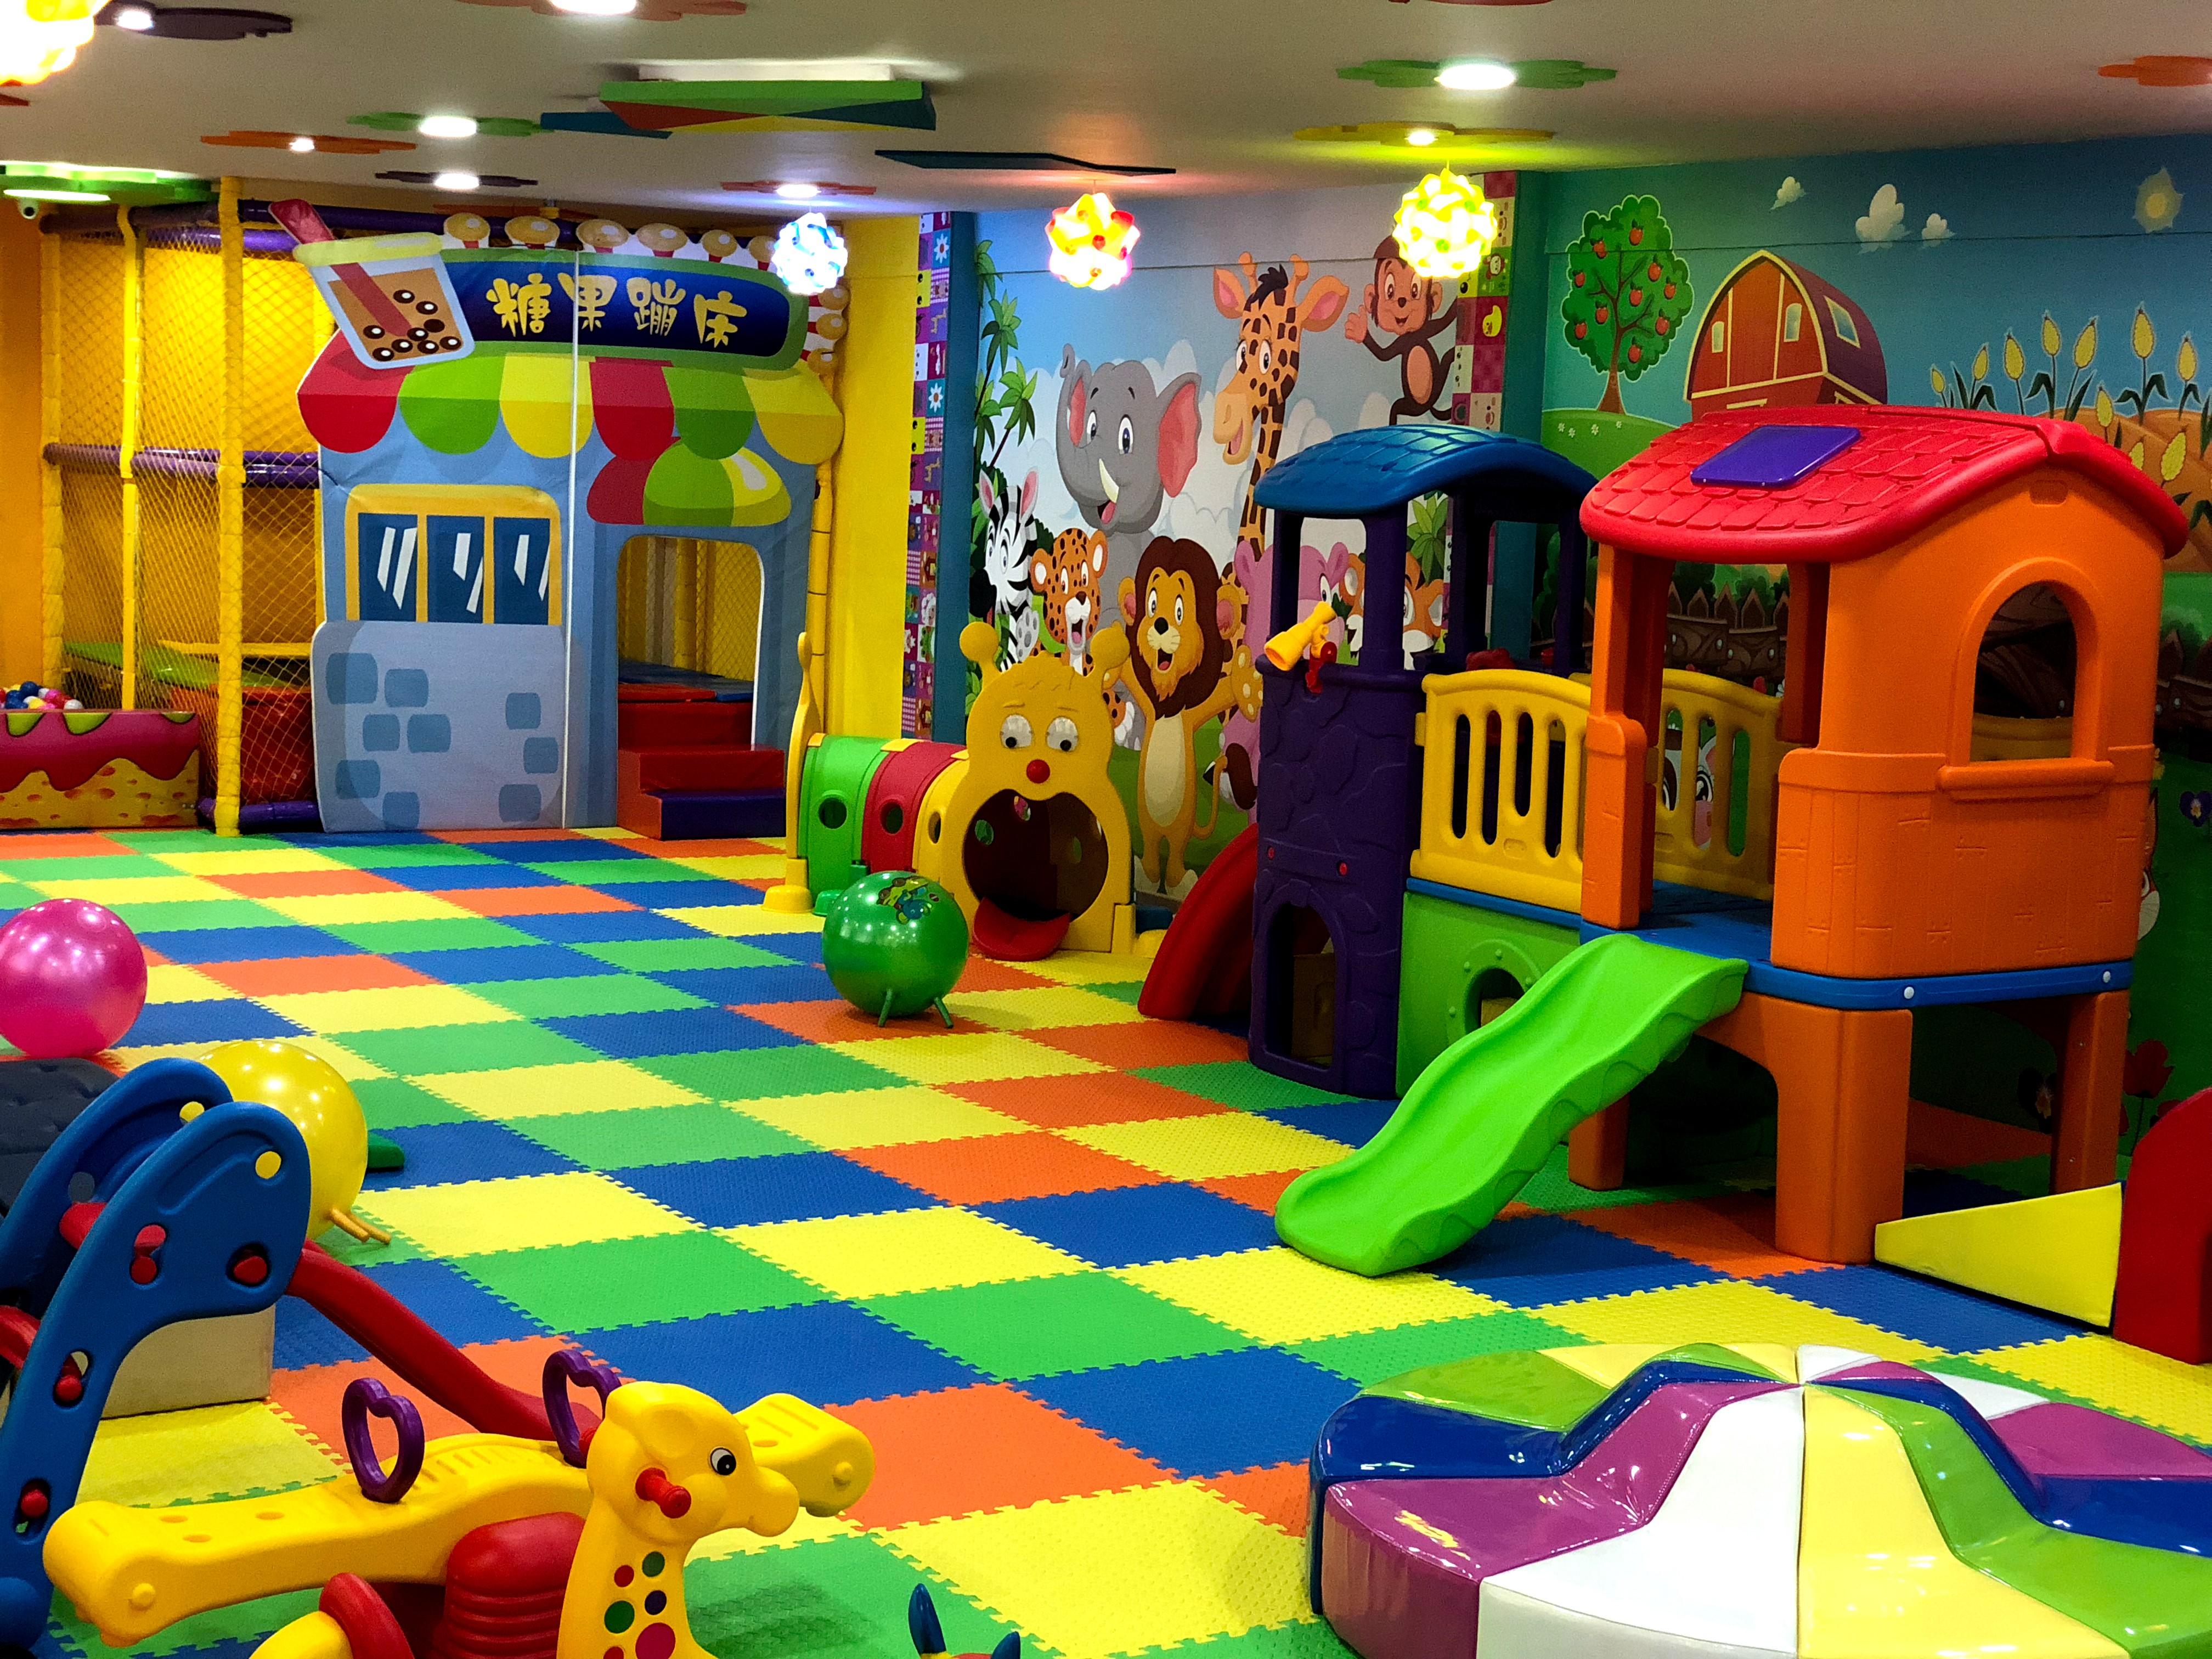 infant play zone 3 little fun world childrens playzone hsr